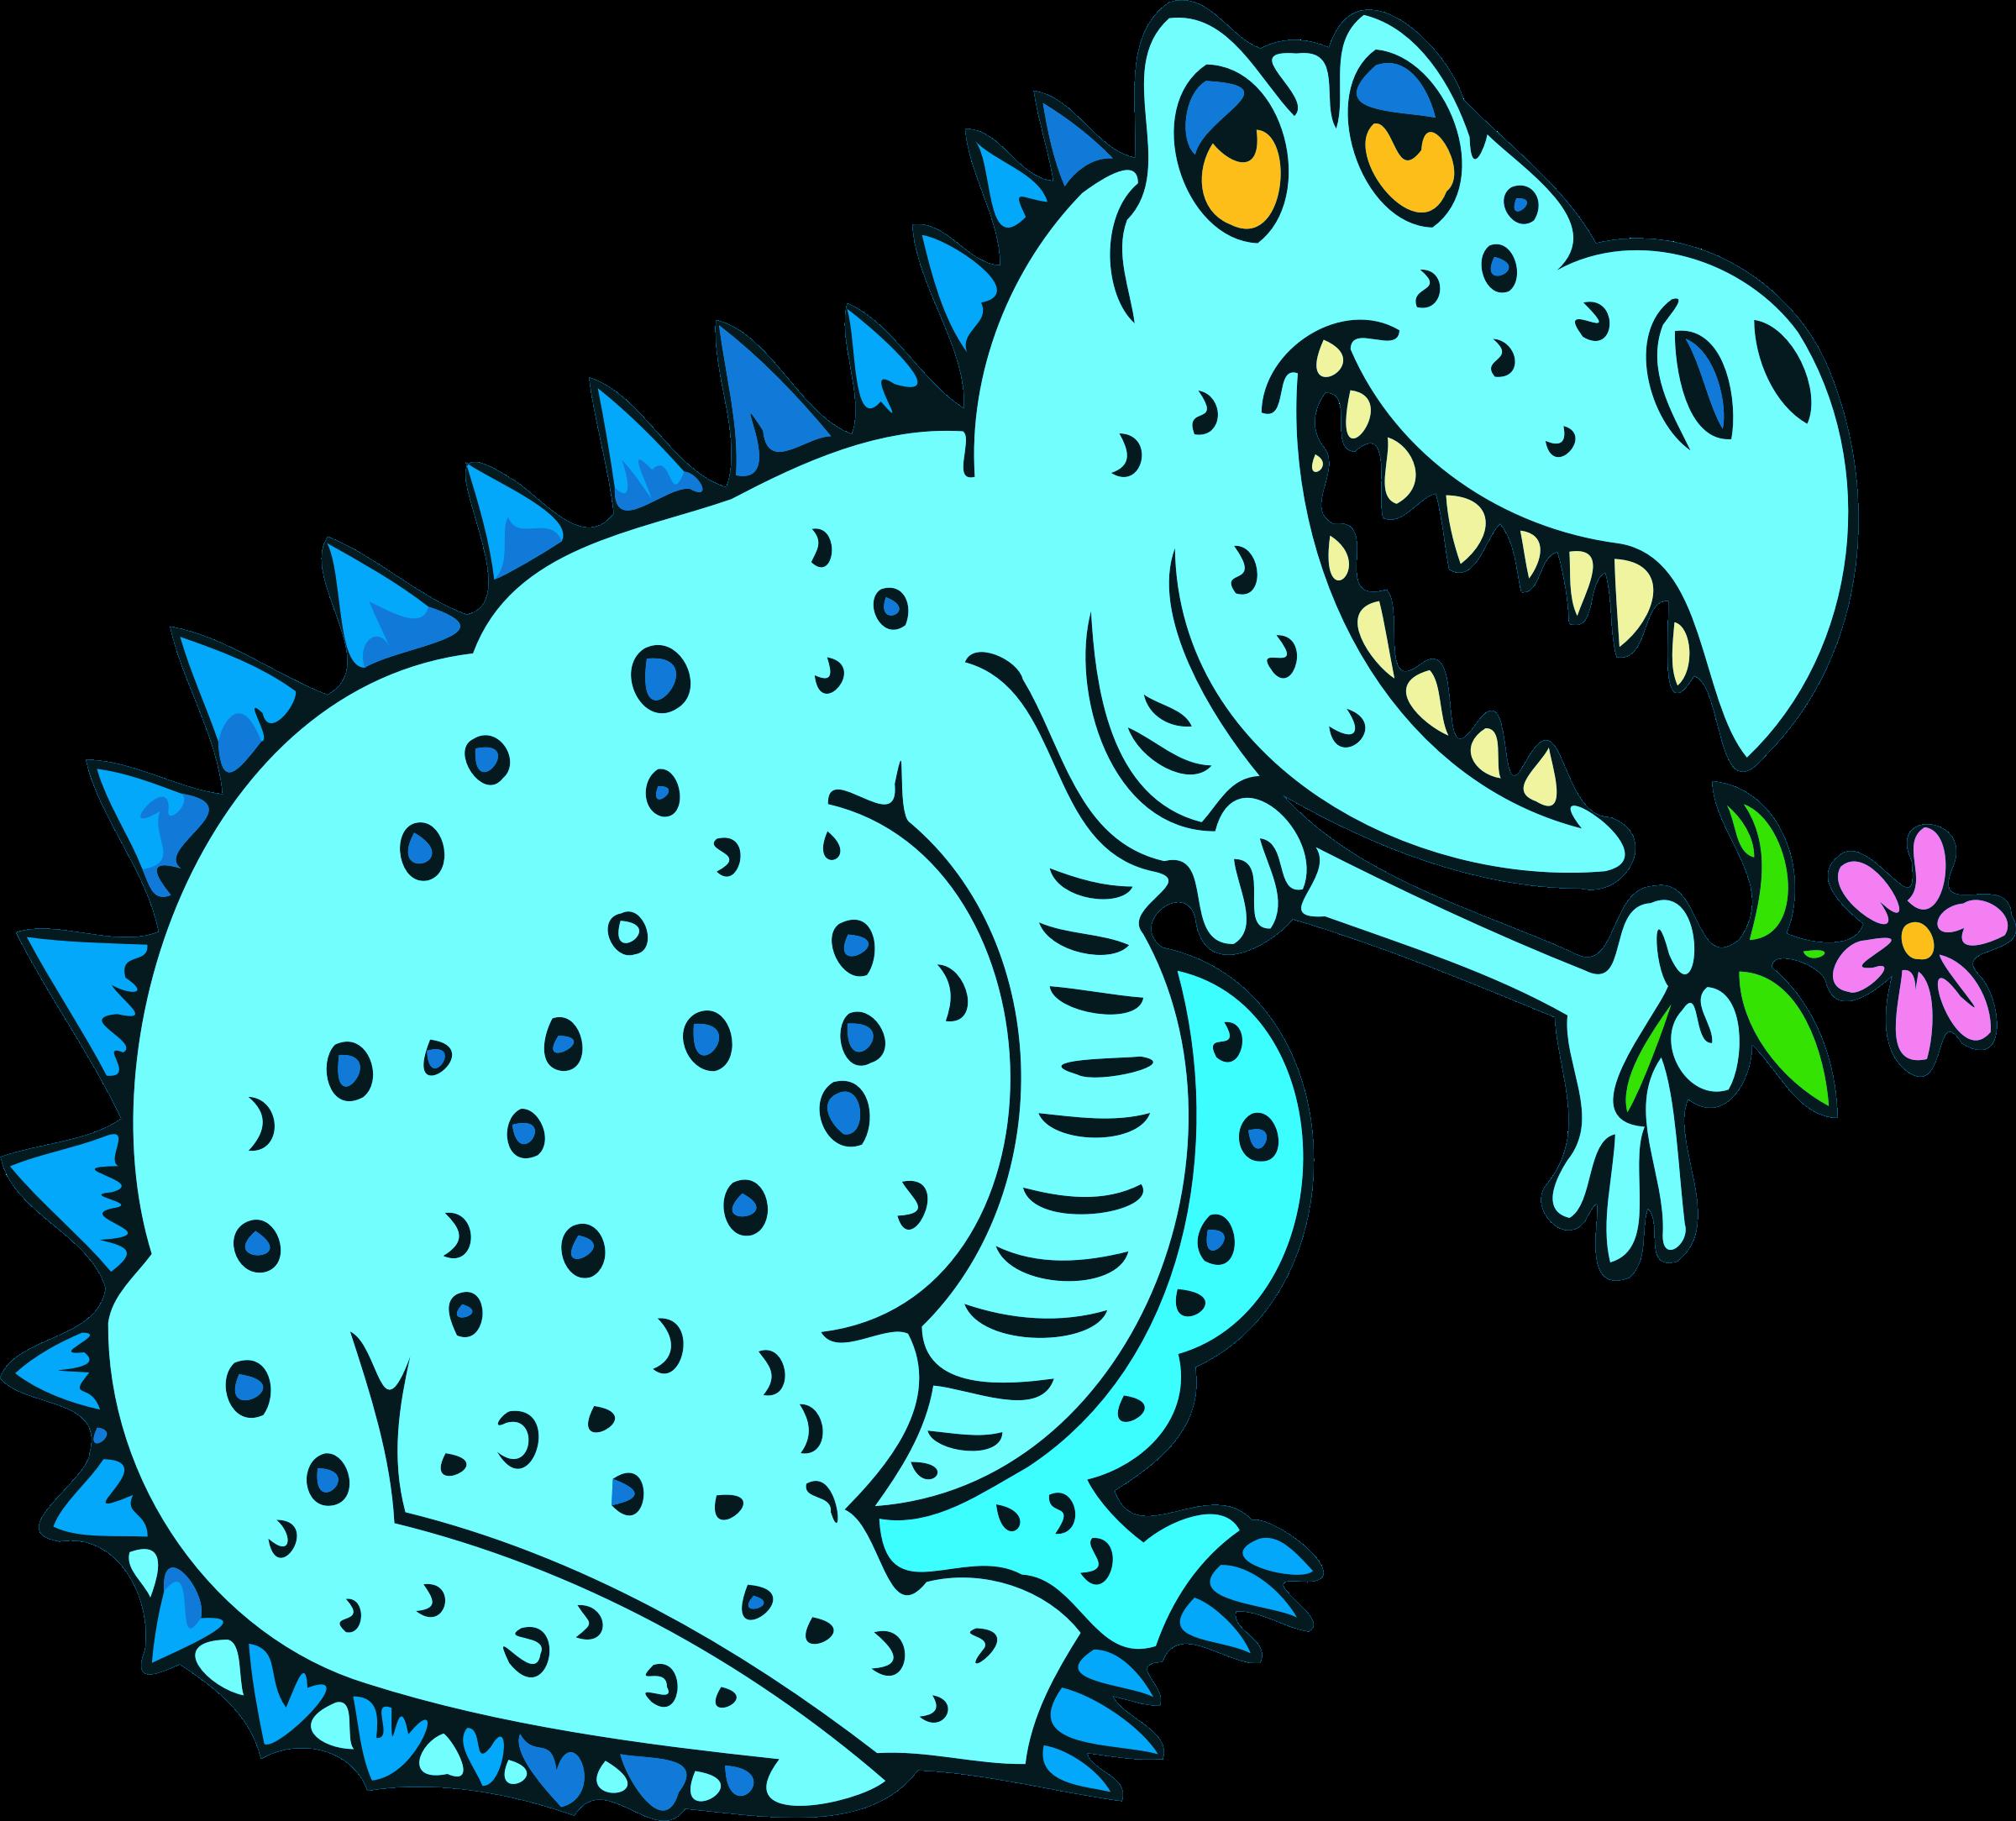 Dinosaur big image png. Dinosaurs clipart happy